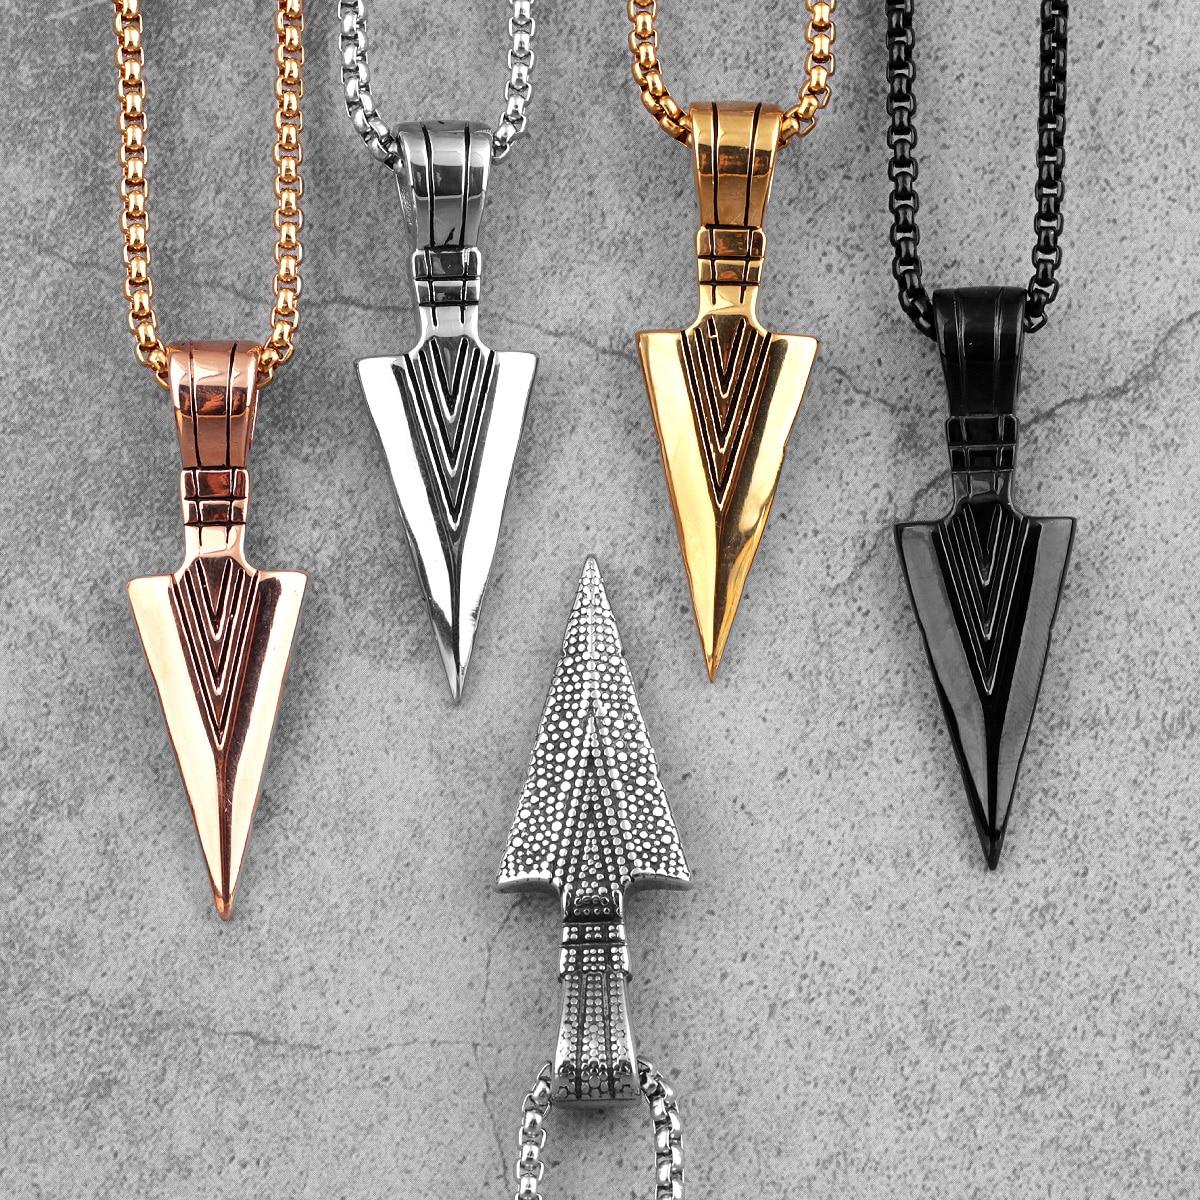 Sparta Spearhead Long Men Necklaces Pendants Chain Punk for Boyfriend Male Stainless Steel Jewelry Creativity Gift Wholesale